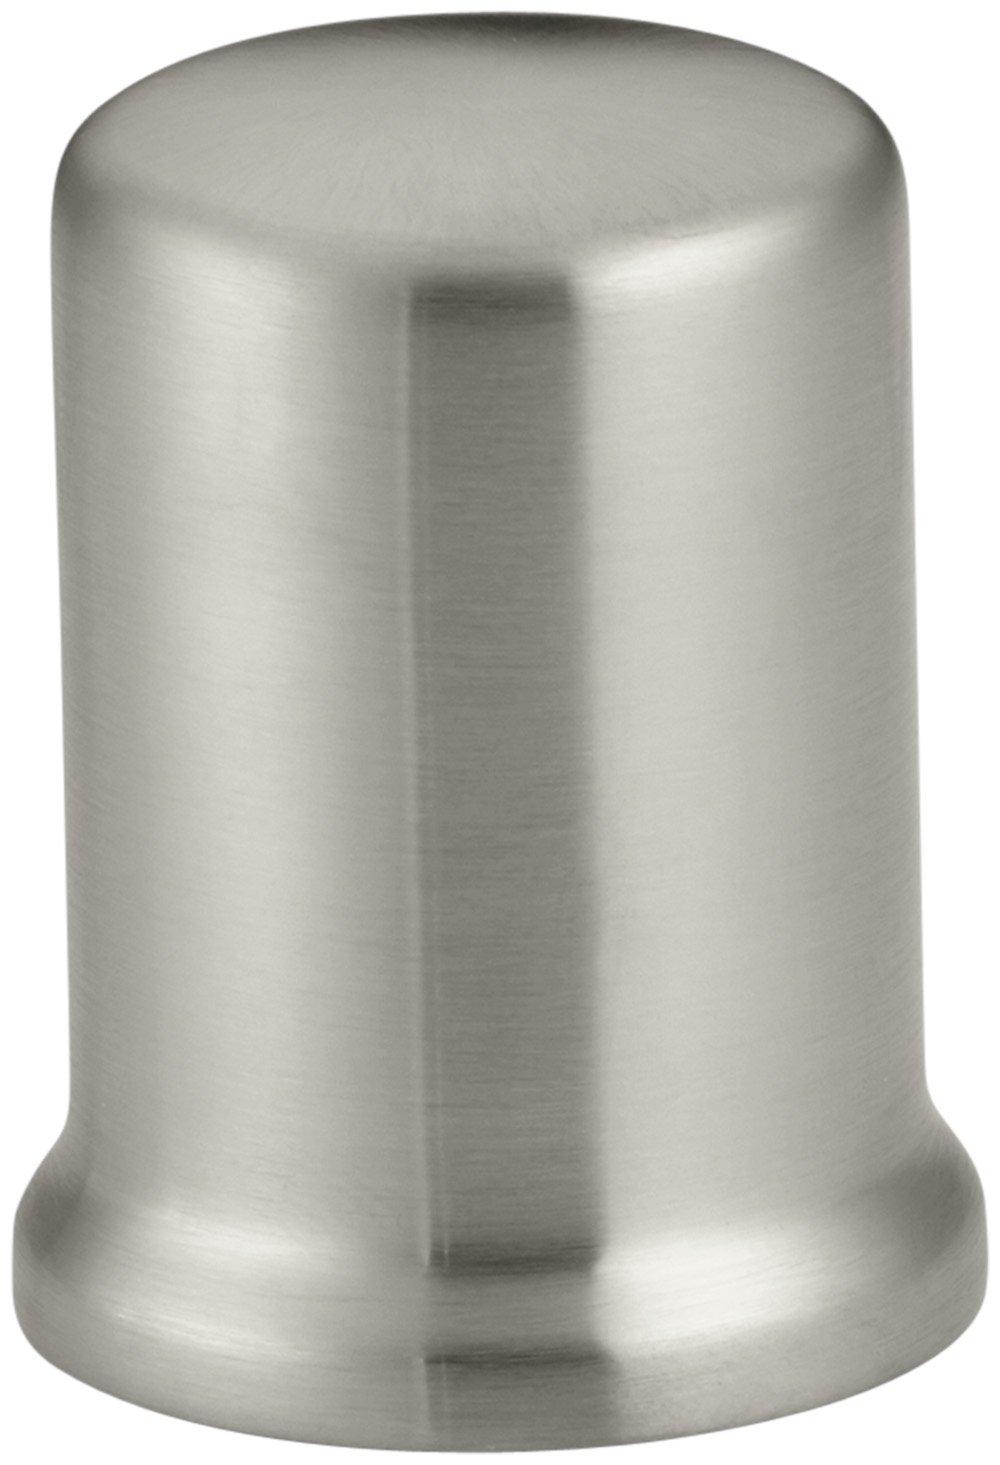 KOHLER K-9111-BN Air Gap Cover with Collar, Vibrant Brushed Nickel